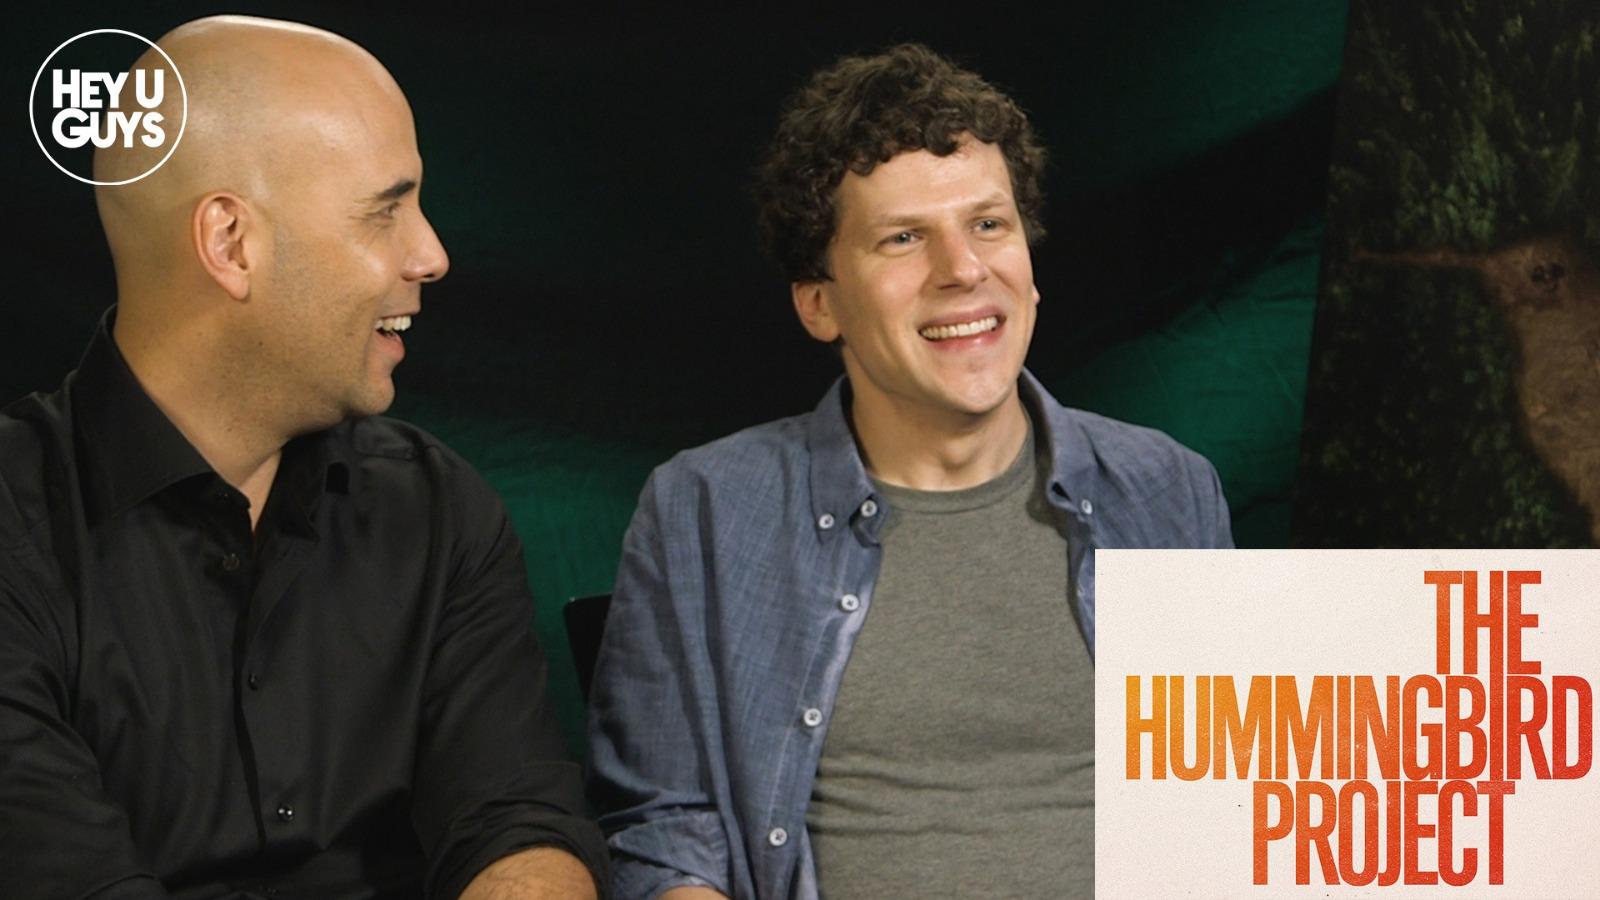 Jesse Eisenberg and Kim Nguyen on The Hummingbird Project ...